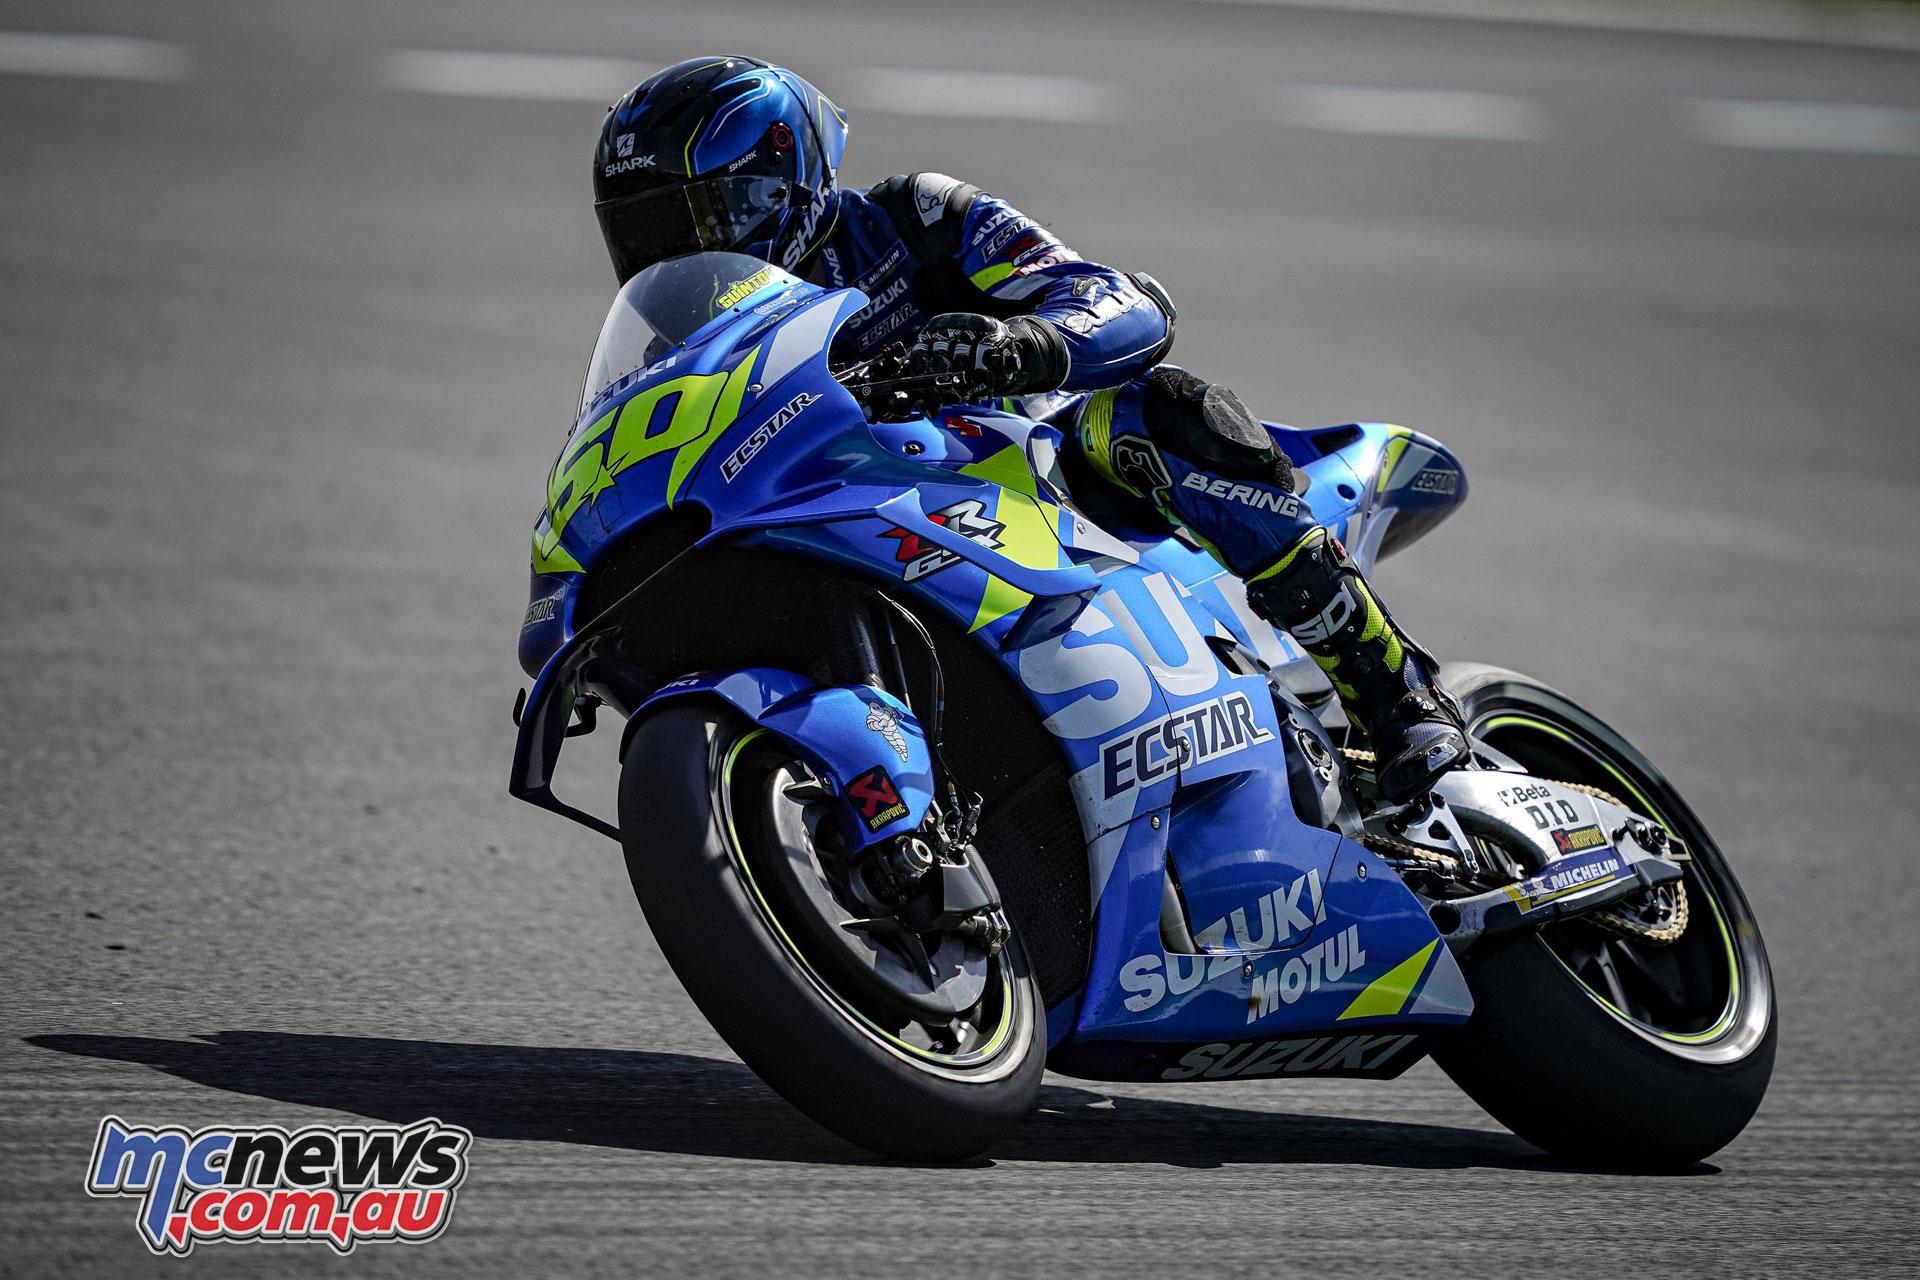 MotoGP Rnd Silverstone sylvain guintoli